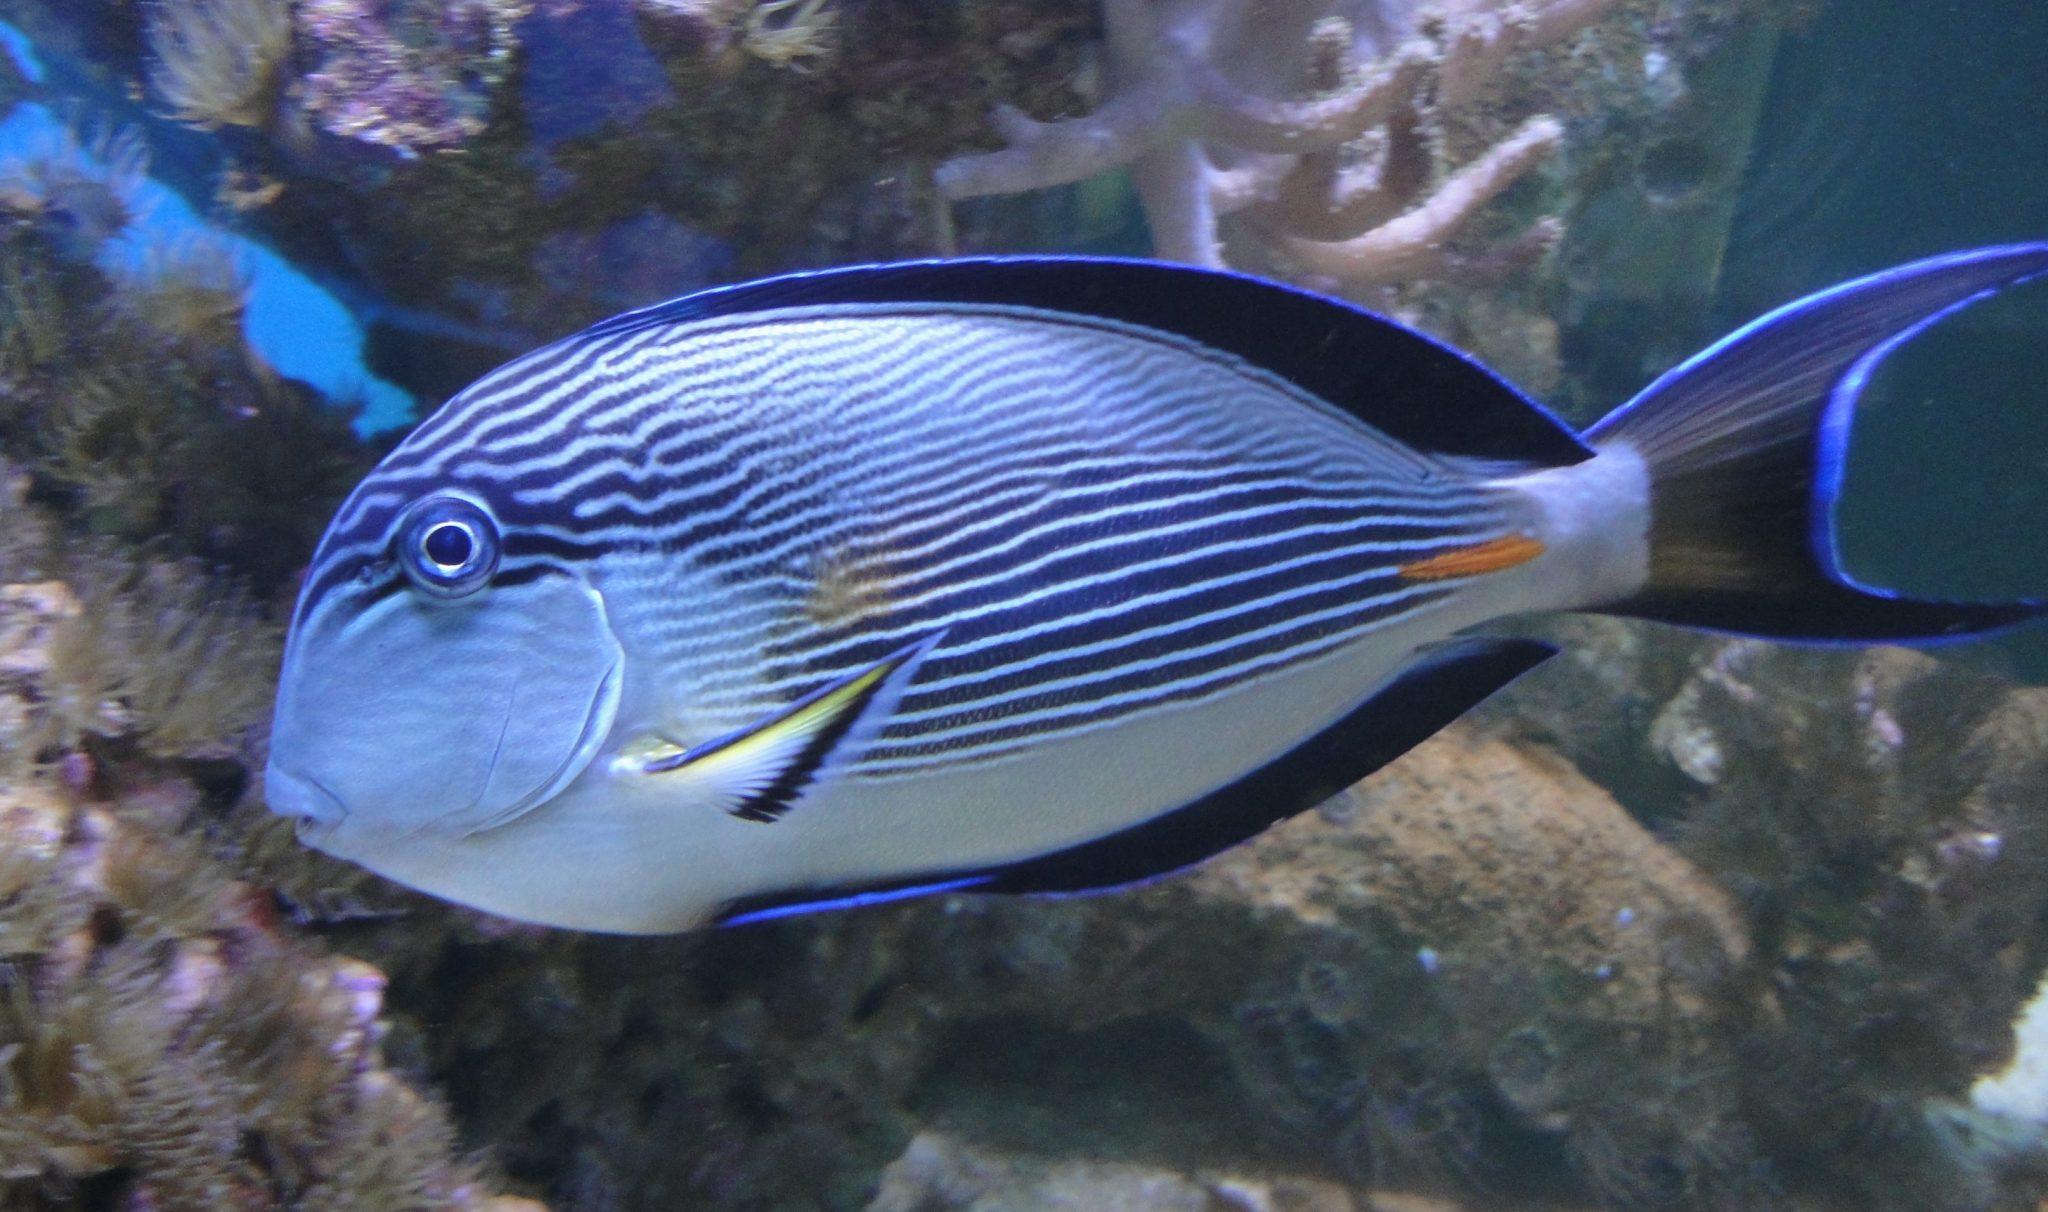 Lined Surgeonfish, Blue Banded Surgeonfish, Blue-lined Surgeonfish, Clown Surgeonfish, Striped Surgeon, Striped Surgeonfish, Zebra Surgeonfish